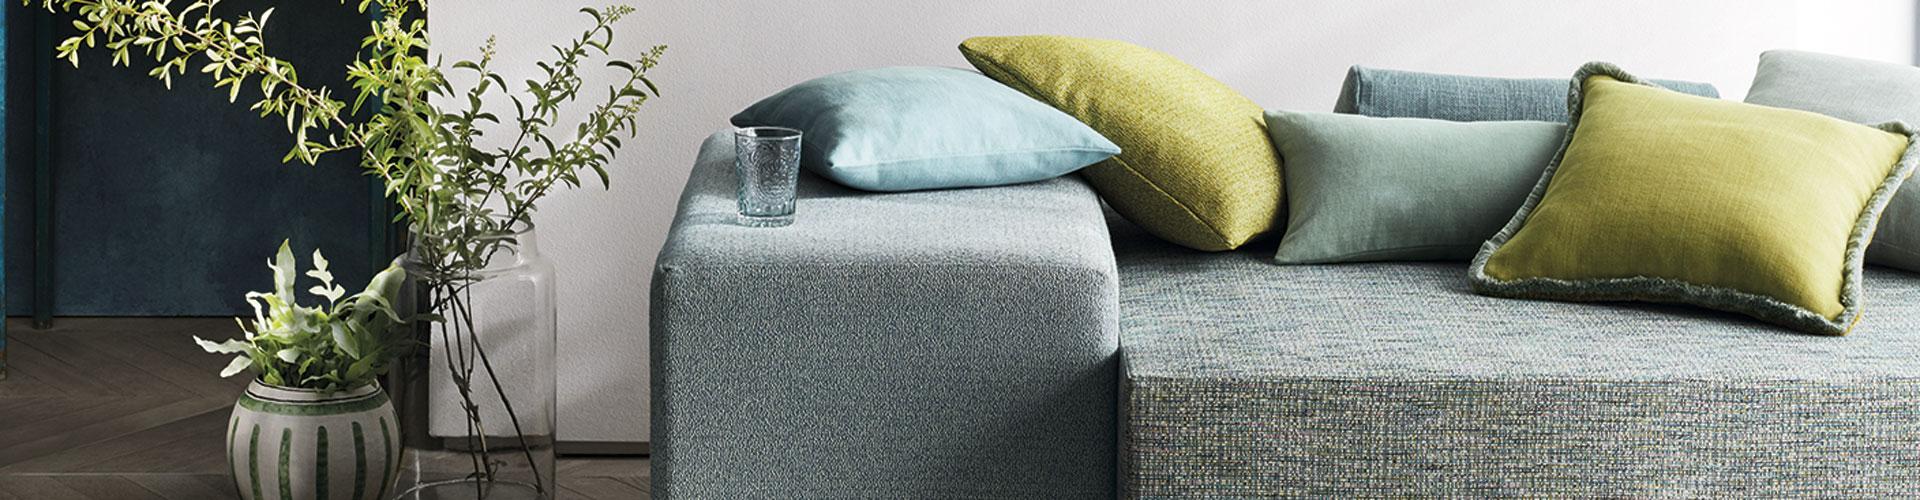 sch nauer textile raumgestaltung raumausstattung mit. Black Bedroom Furniture Sets. Home Design Ideas